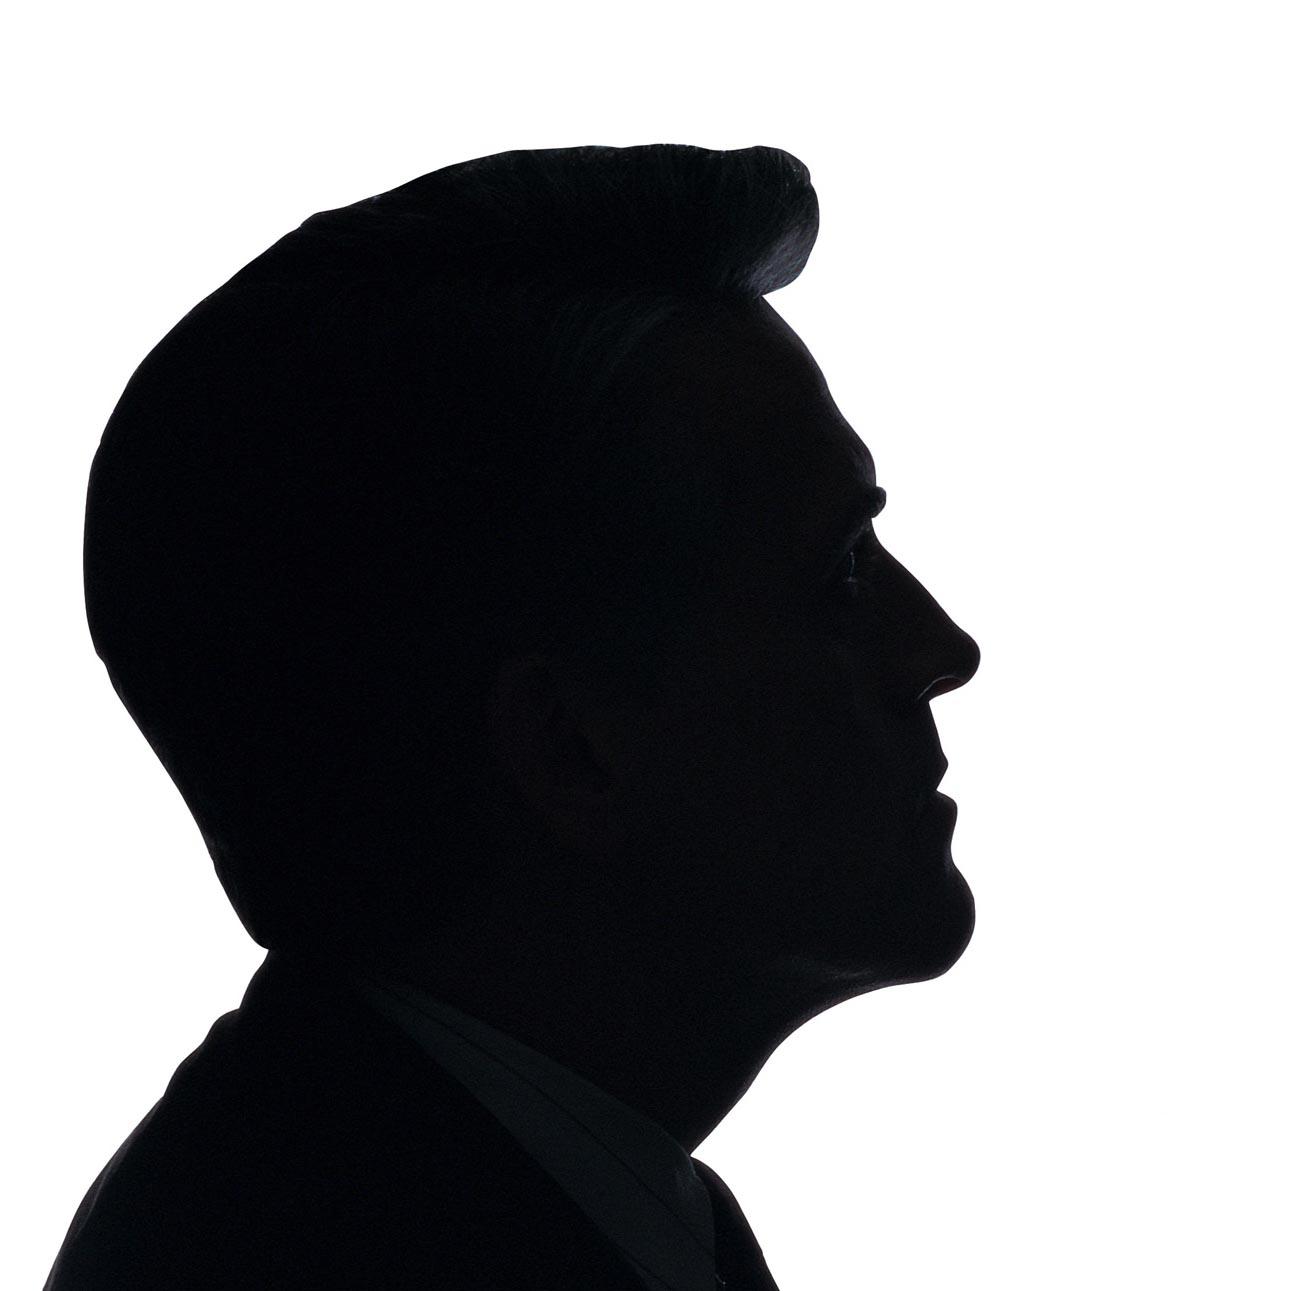 Shadow head clipart image stock Free Silhouette Man Head, Download Free Clip Art, Free Clip ... image stock